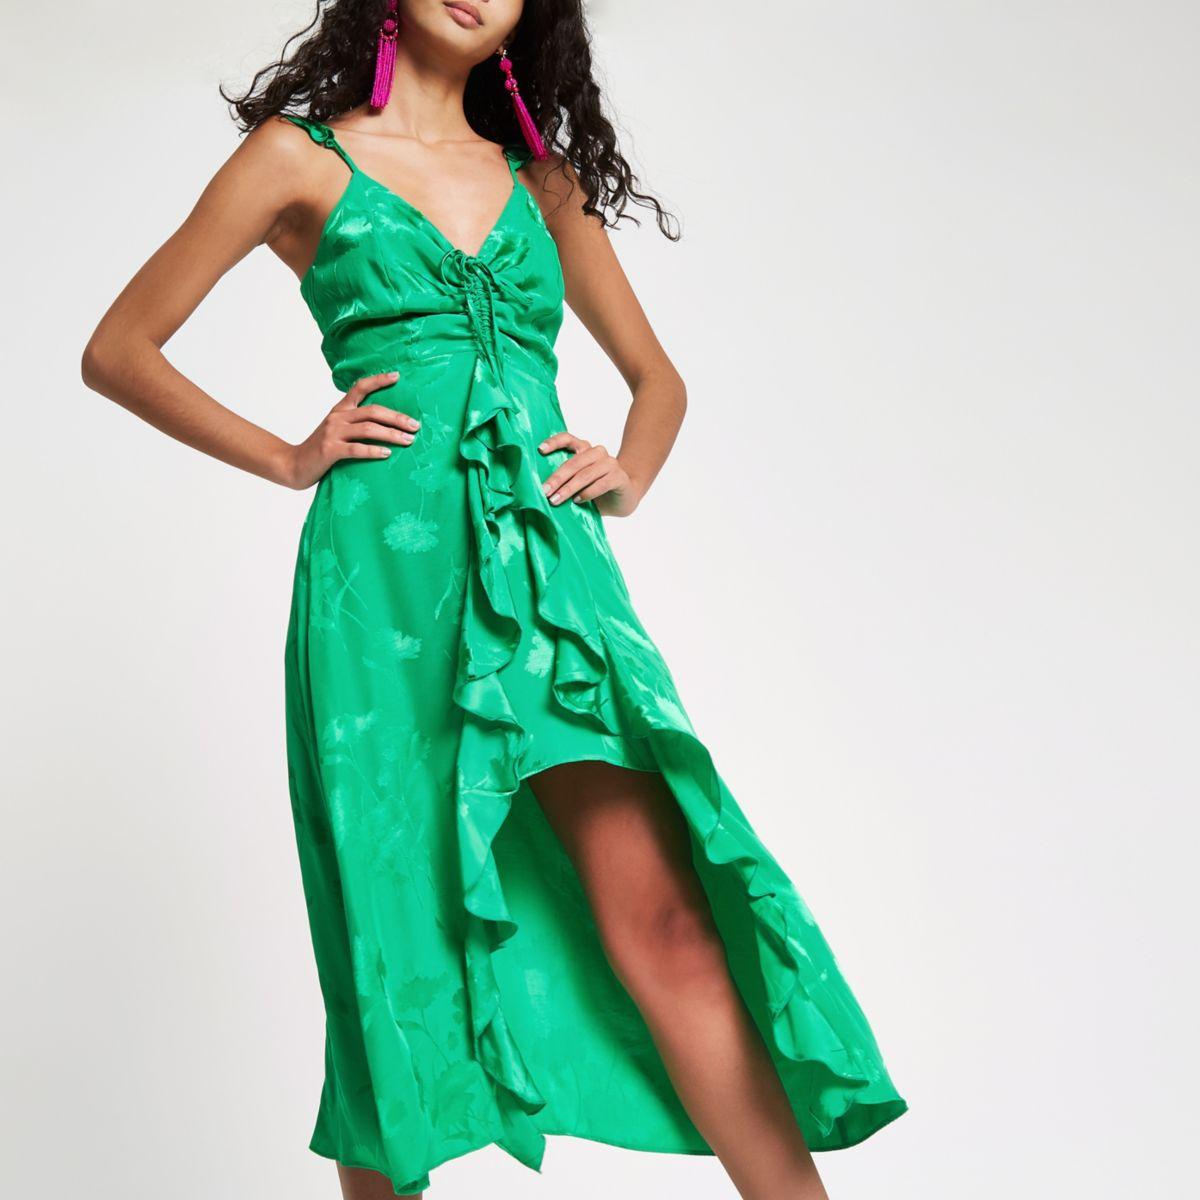 Bright green jacquard frill slip dress